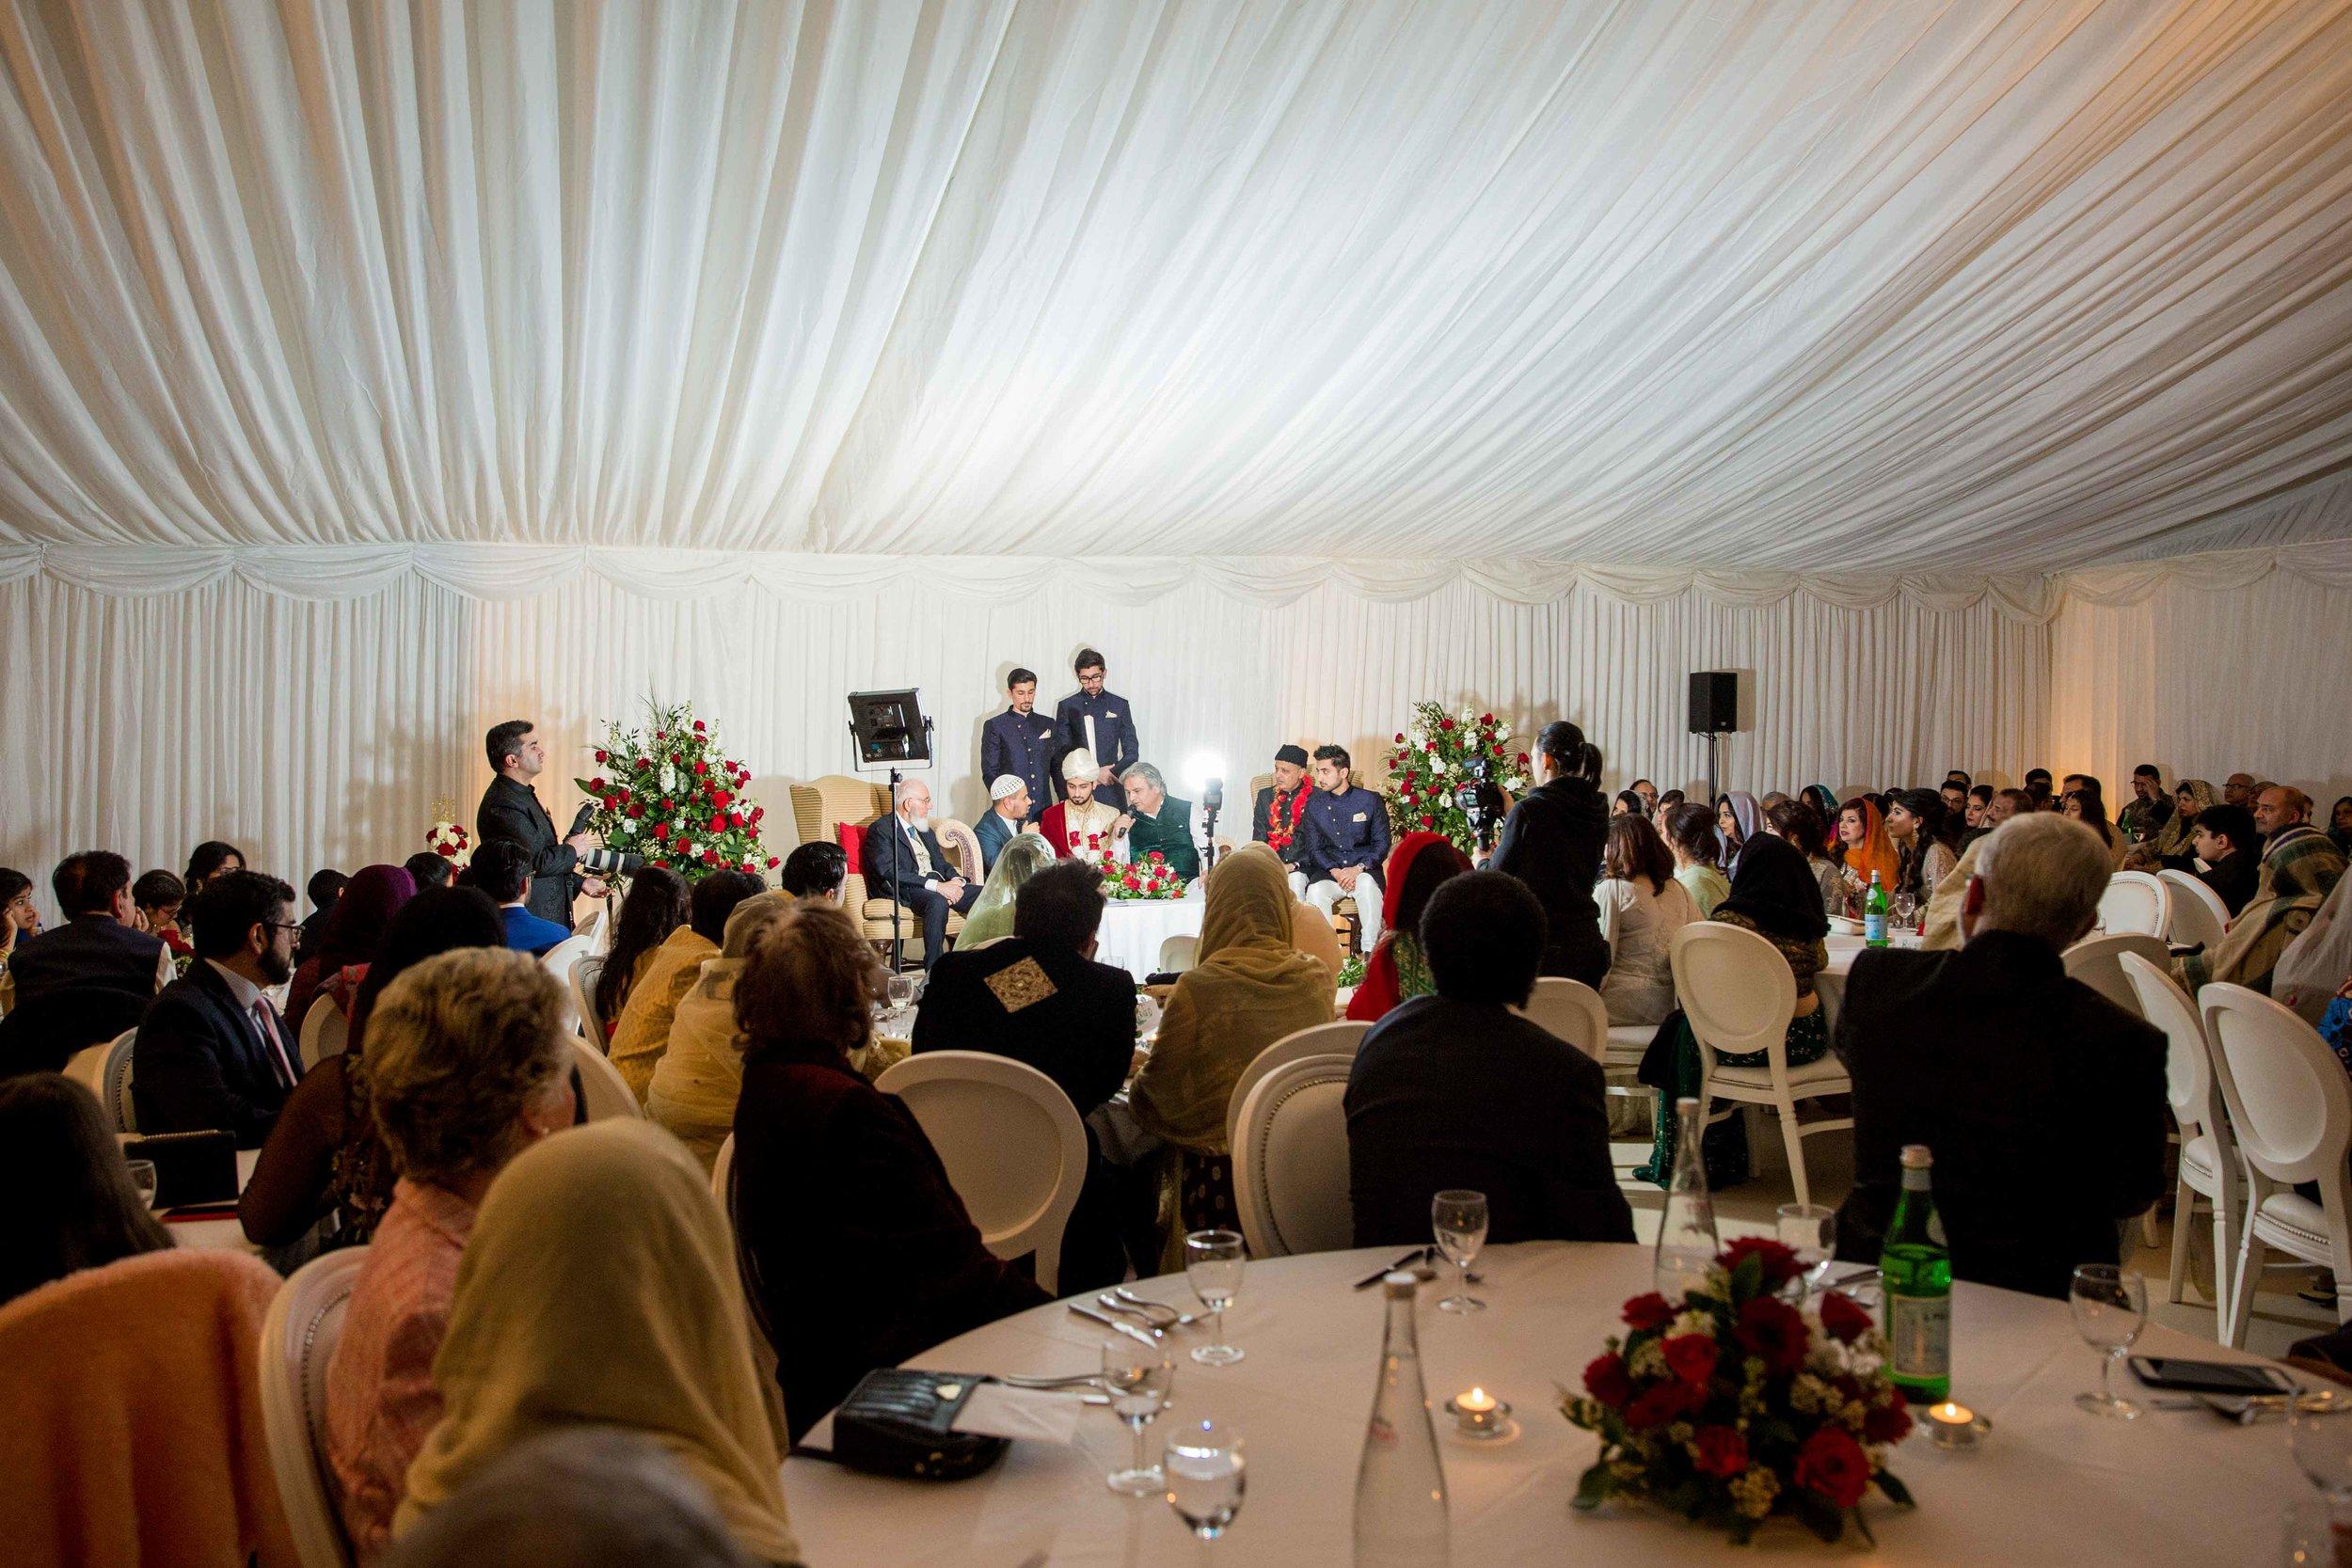 Macdonald-Berystede-Hotel-wedding-female-asian-wedding-photographer-london-natalia-smith-photography-57.jpg